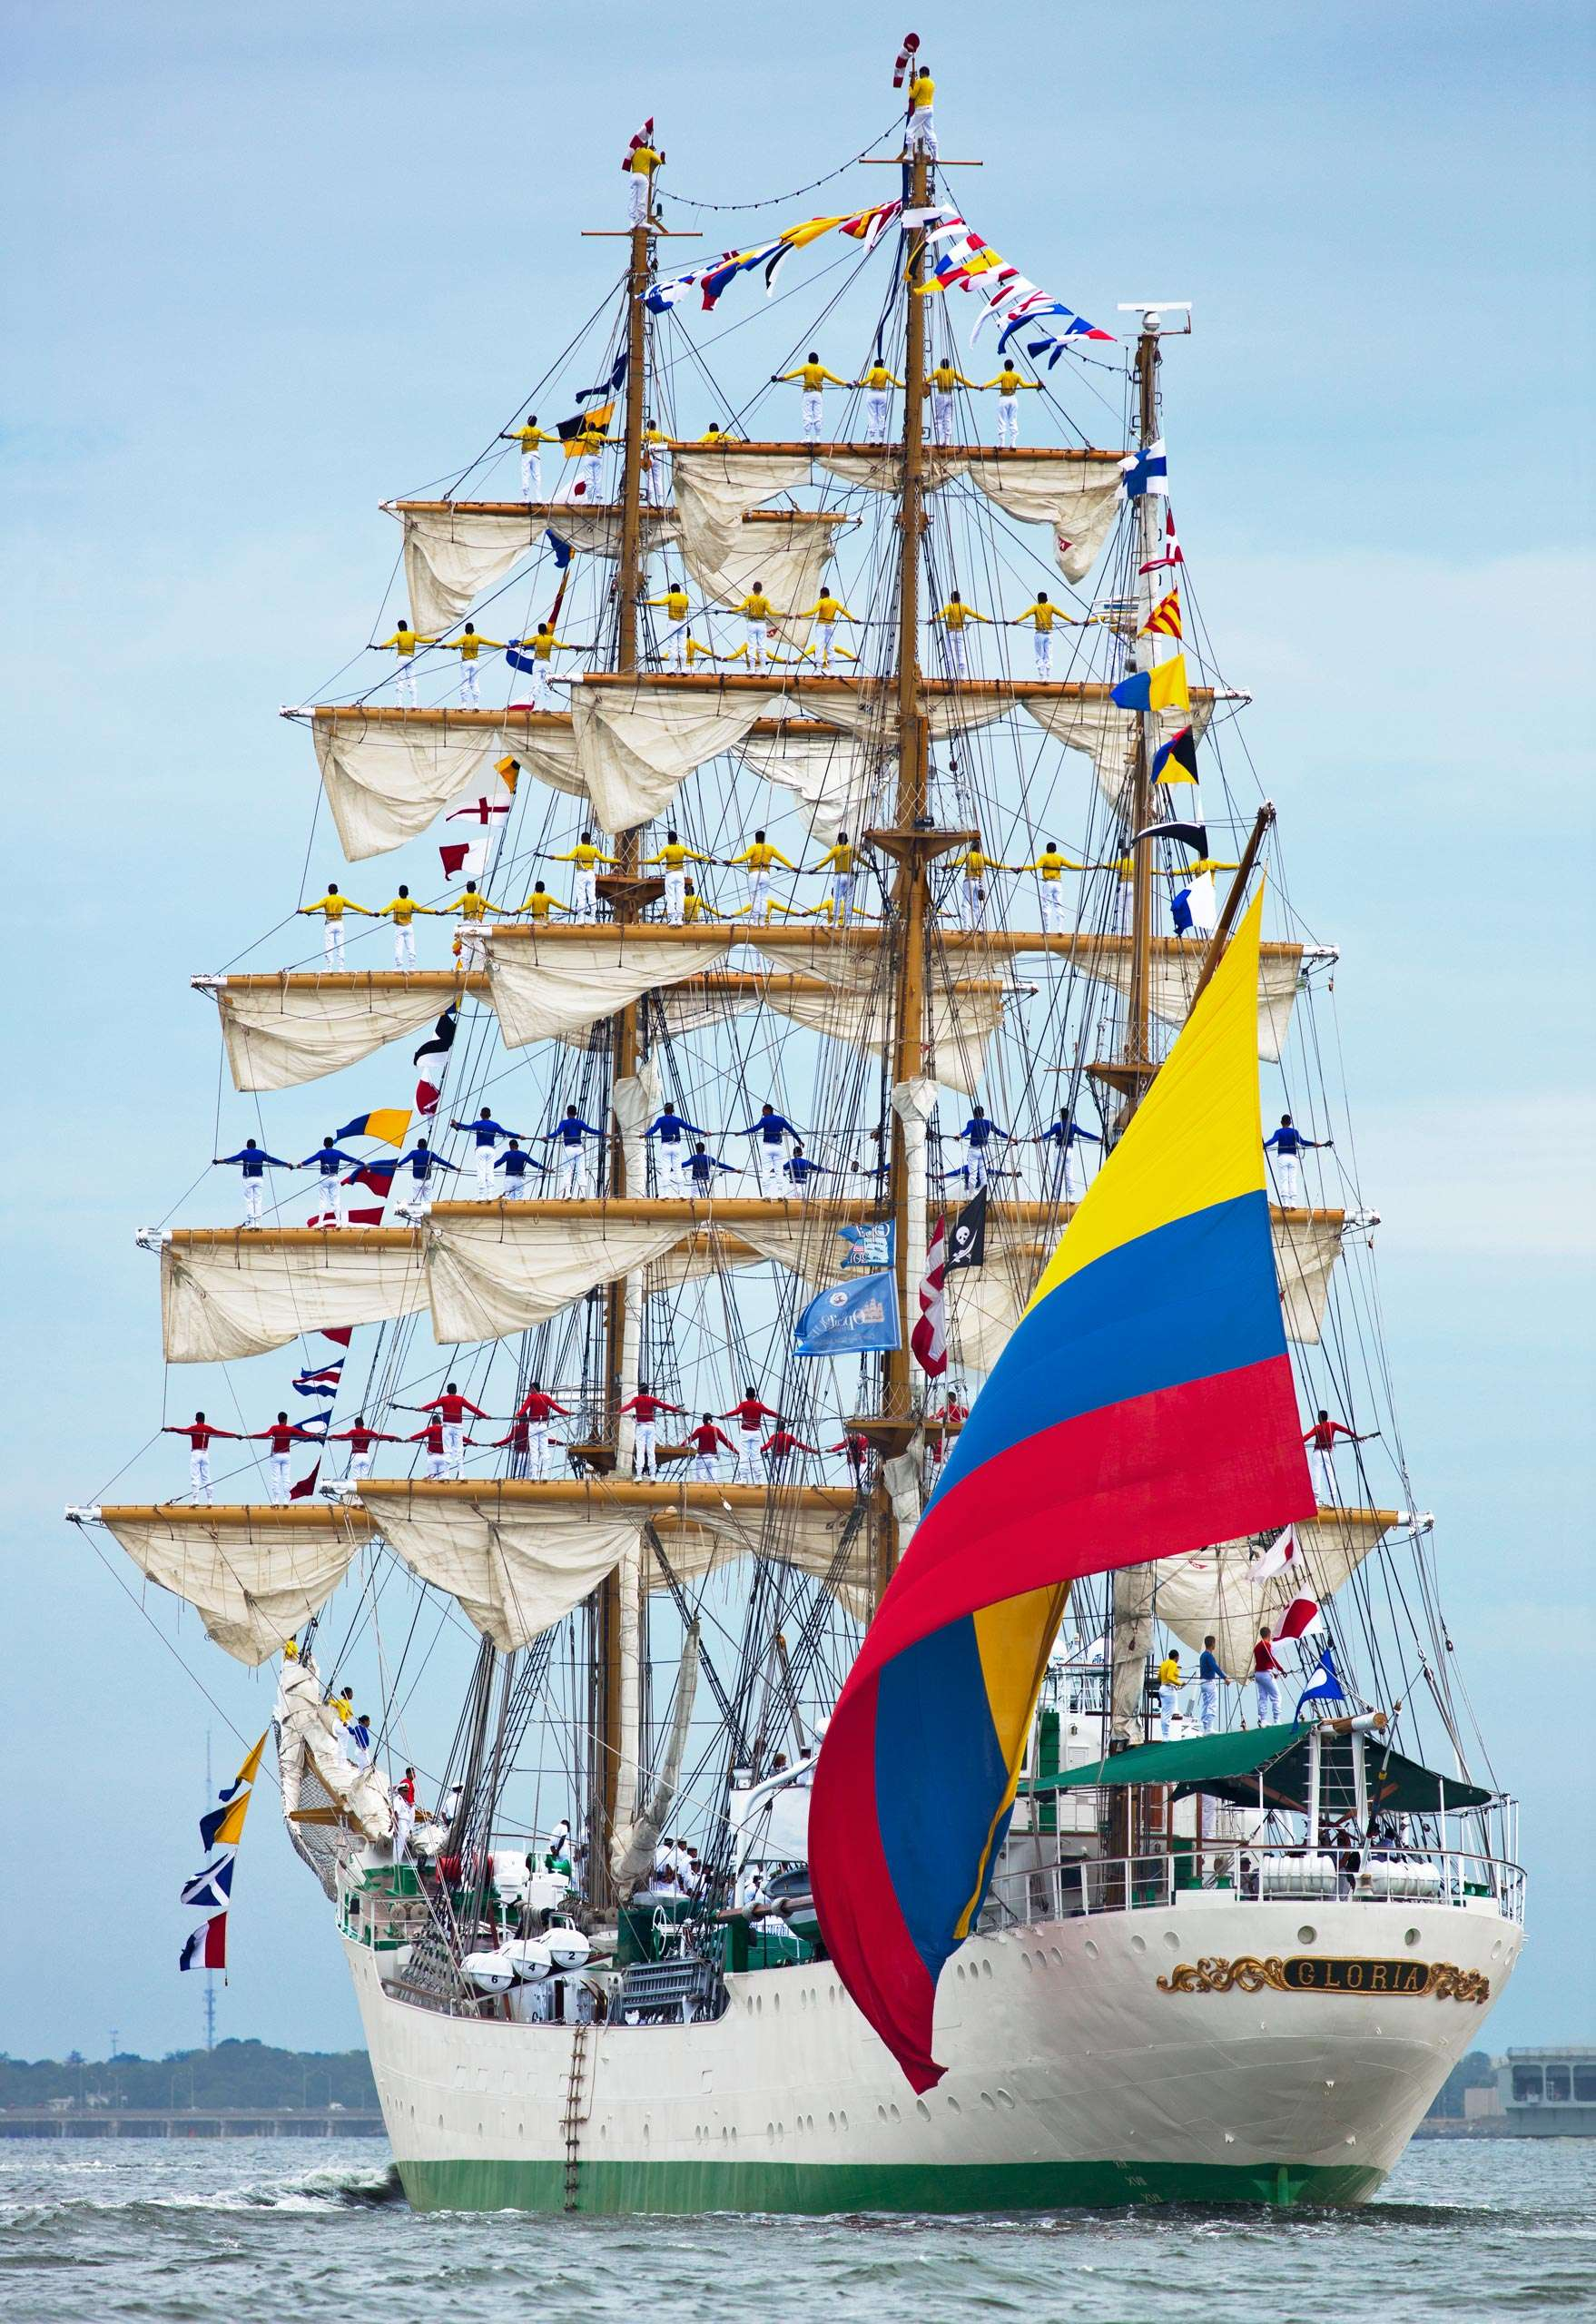 PORTFOLIO - Sailing - Tall Ships #19-PCG765